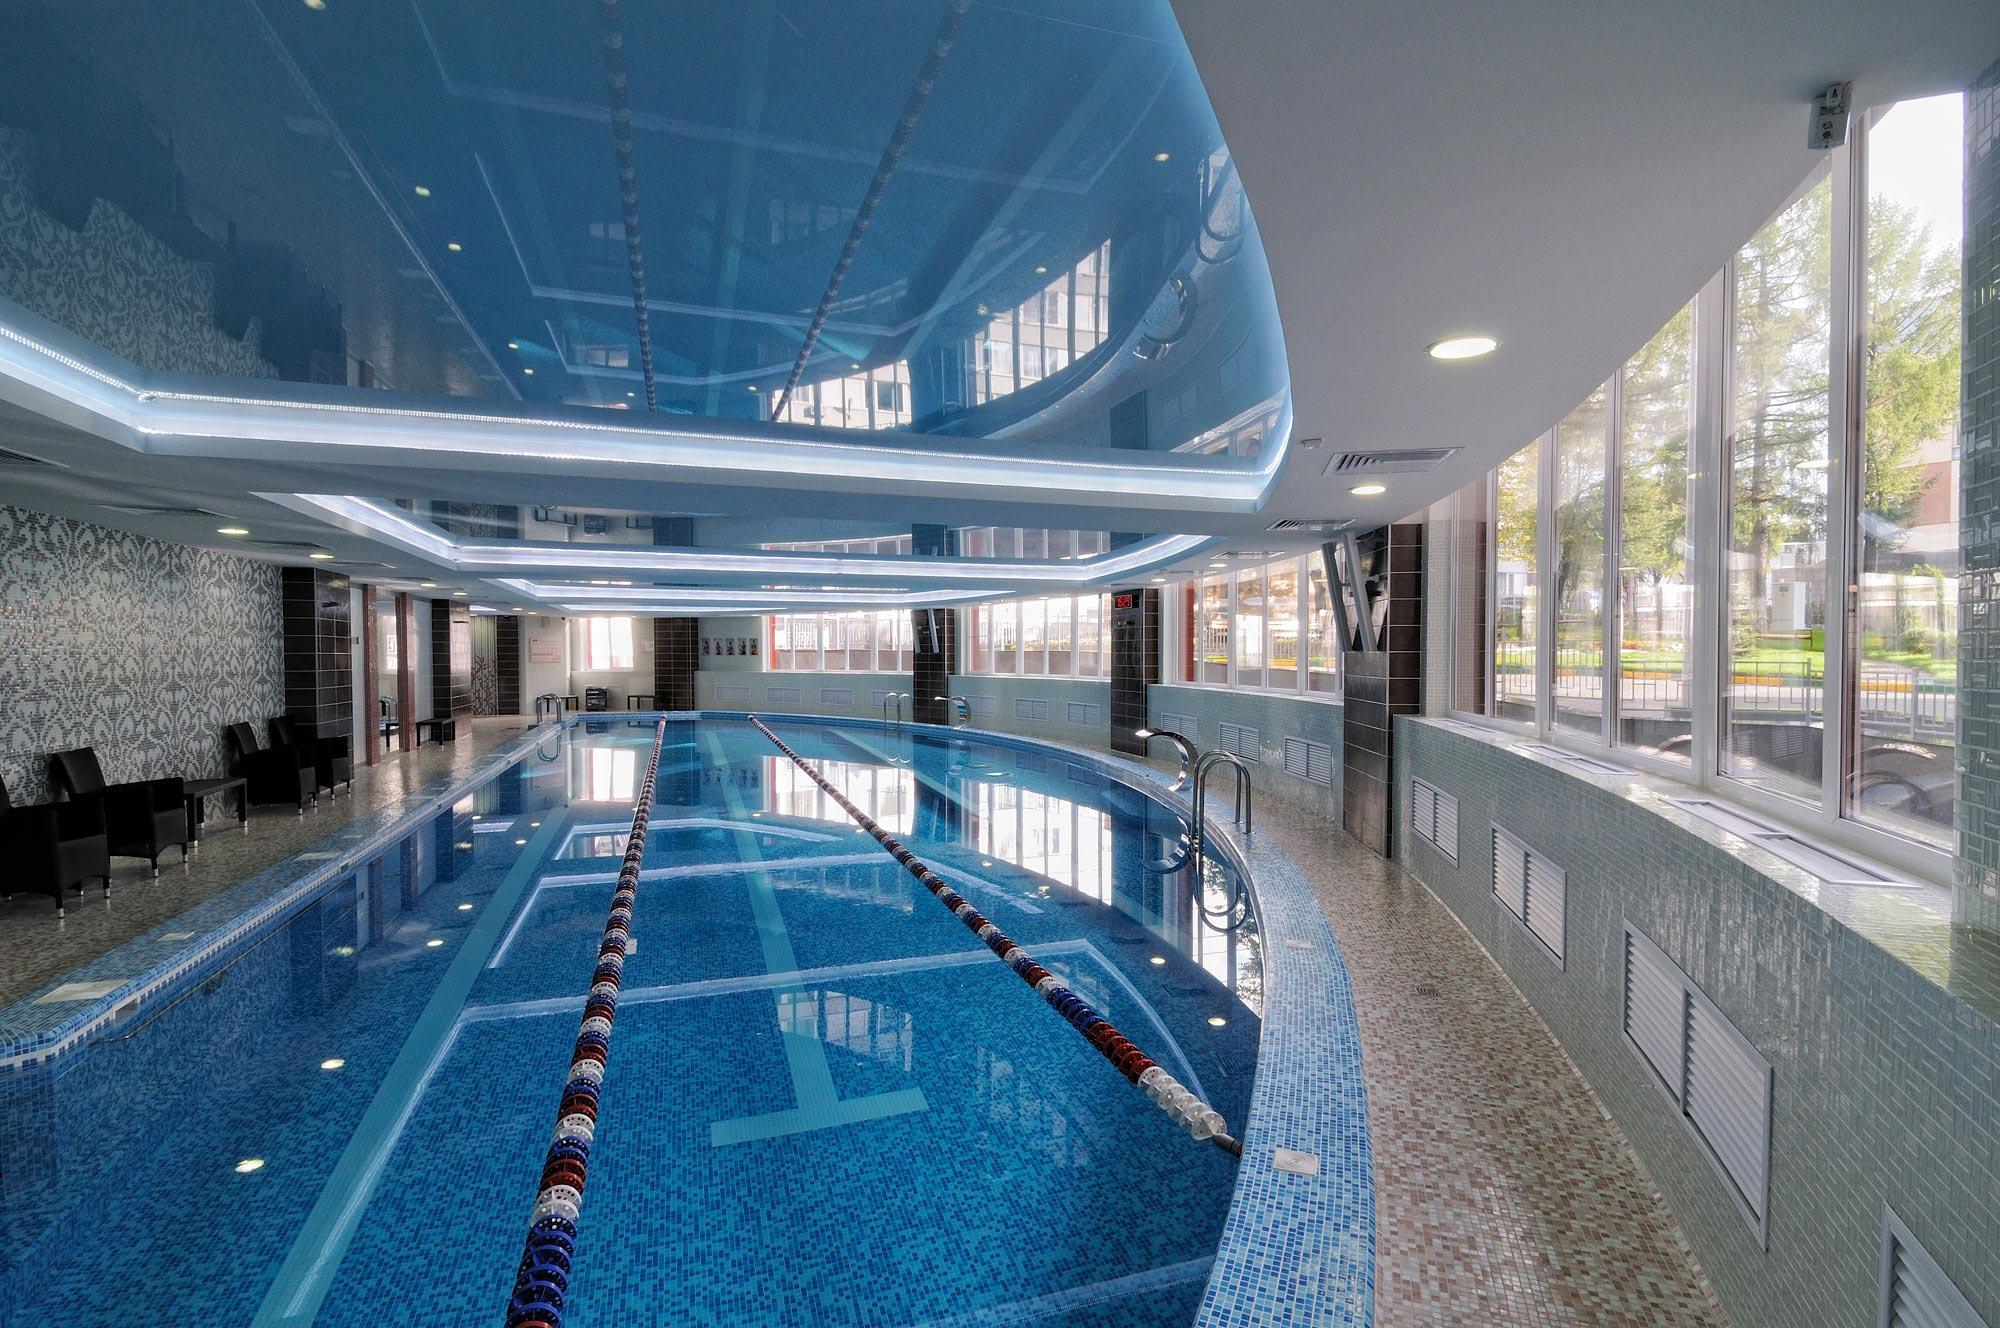 дизайн интерьера бассейн фото